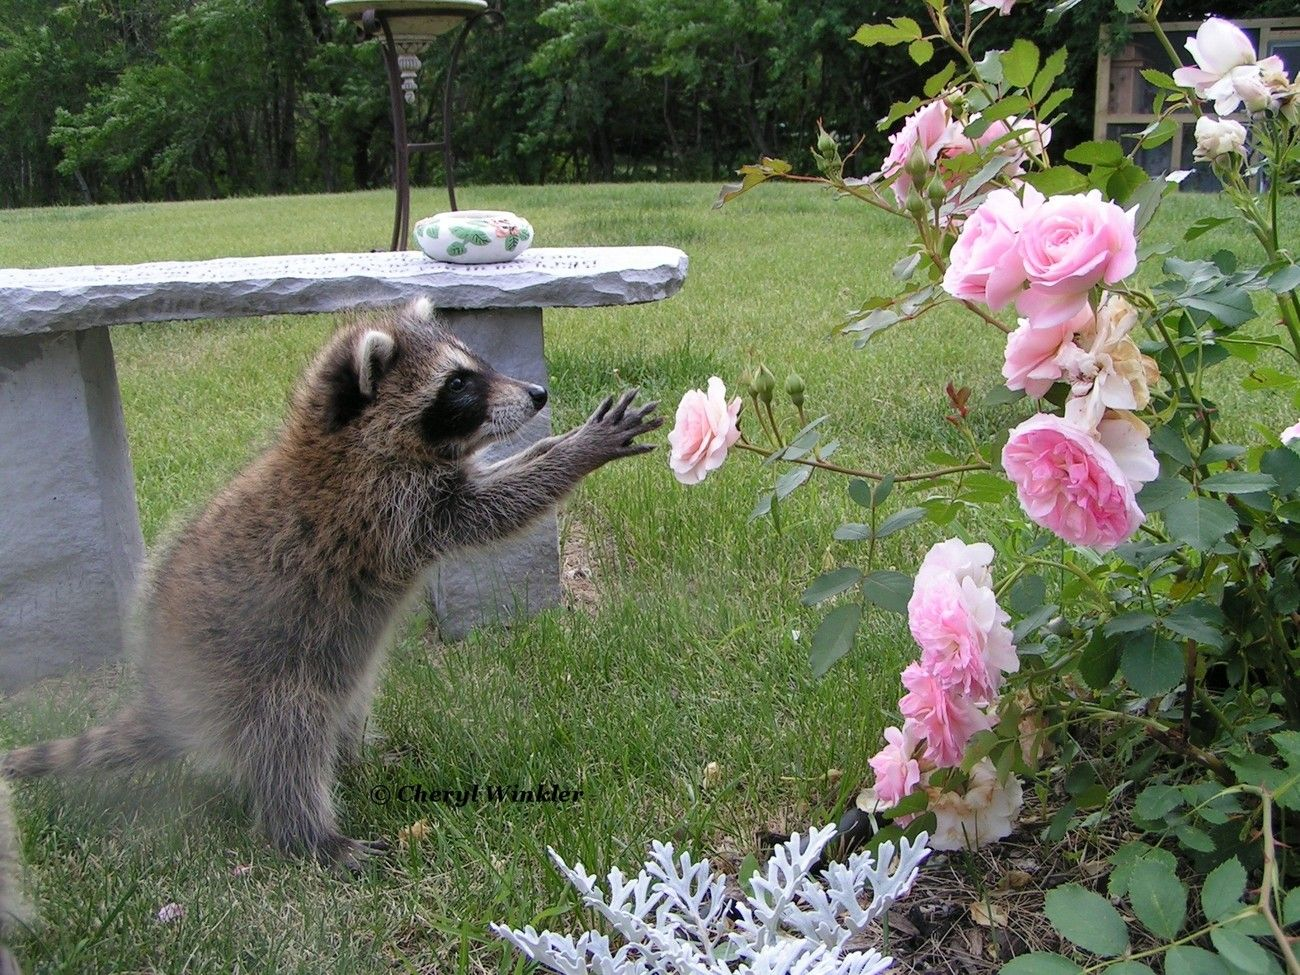 Raccoon Baby explores Roses